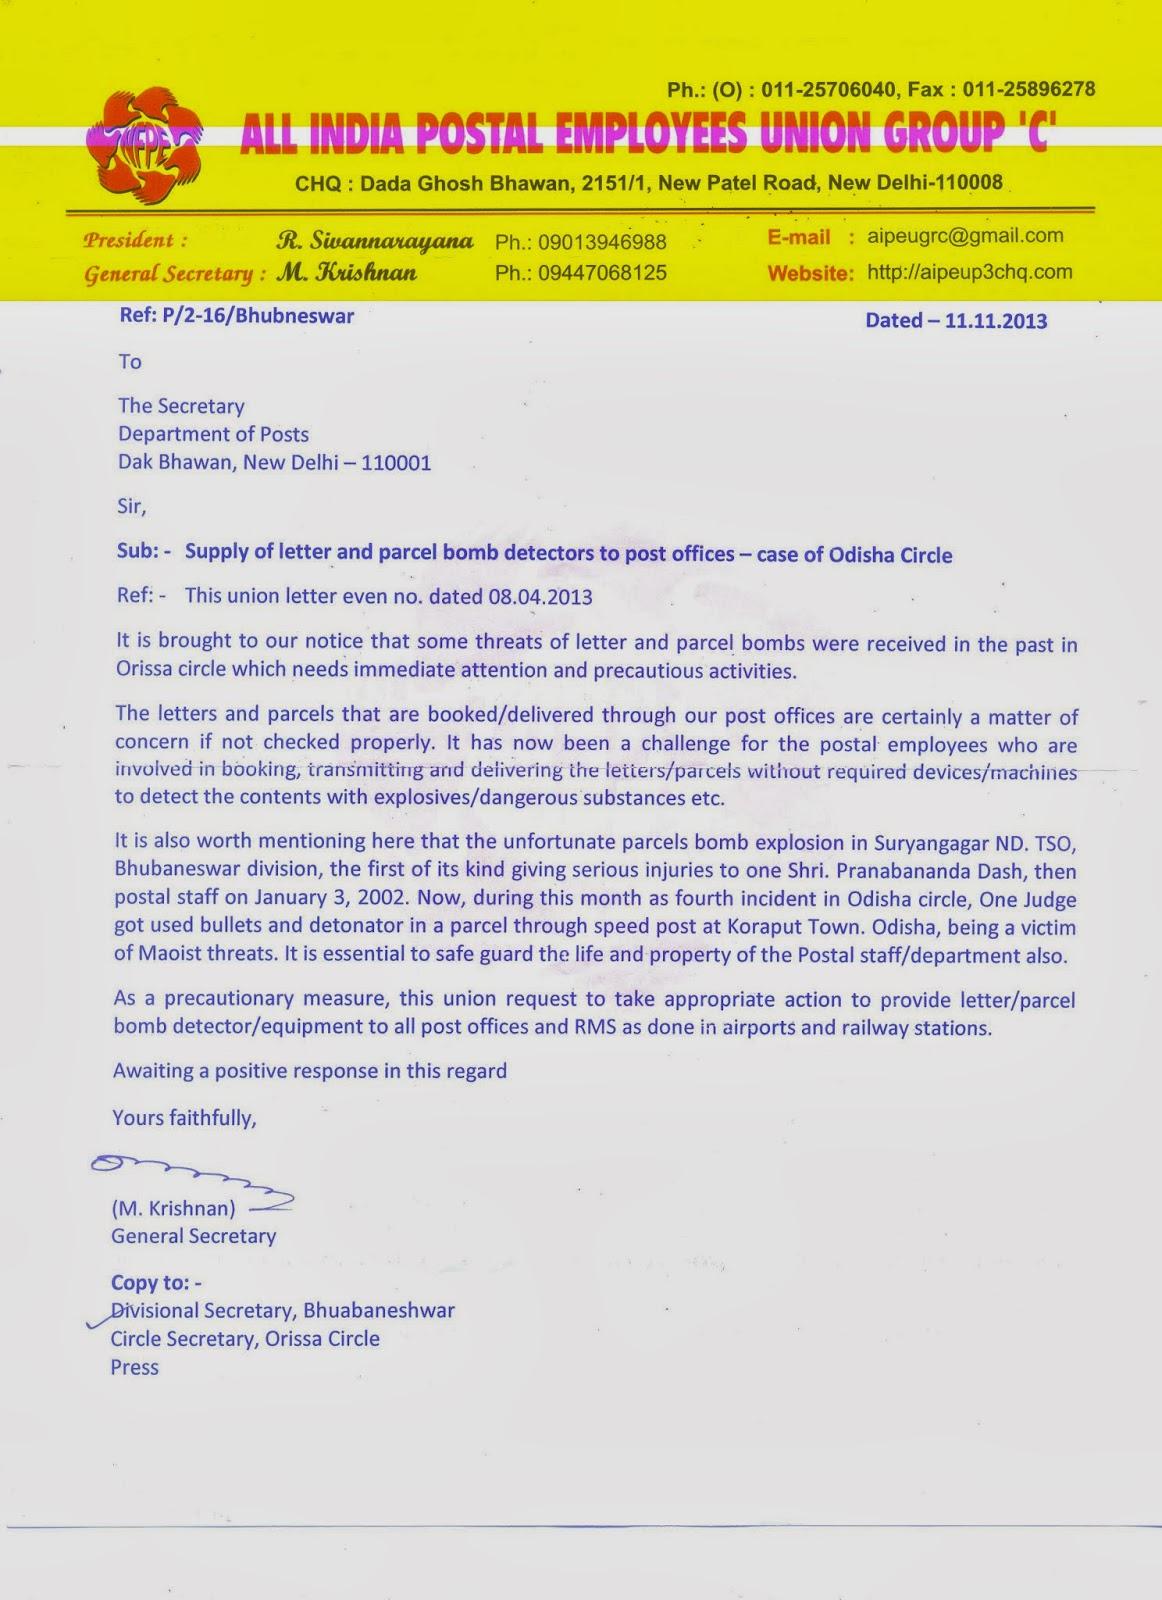 Application Letter To Secretary ] - cover letter cover ...